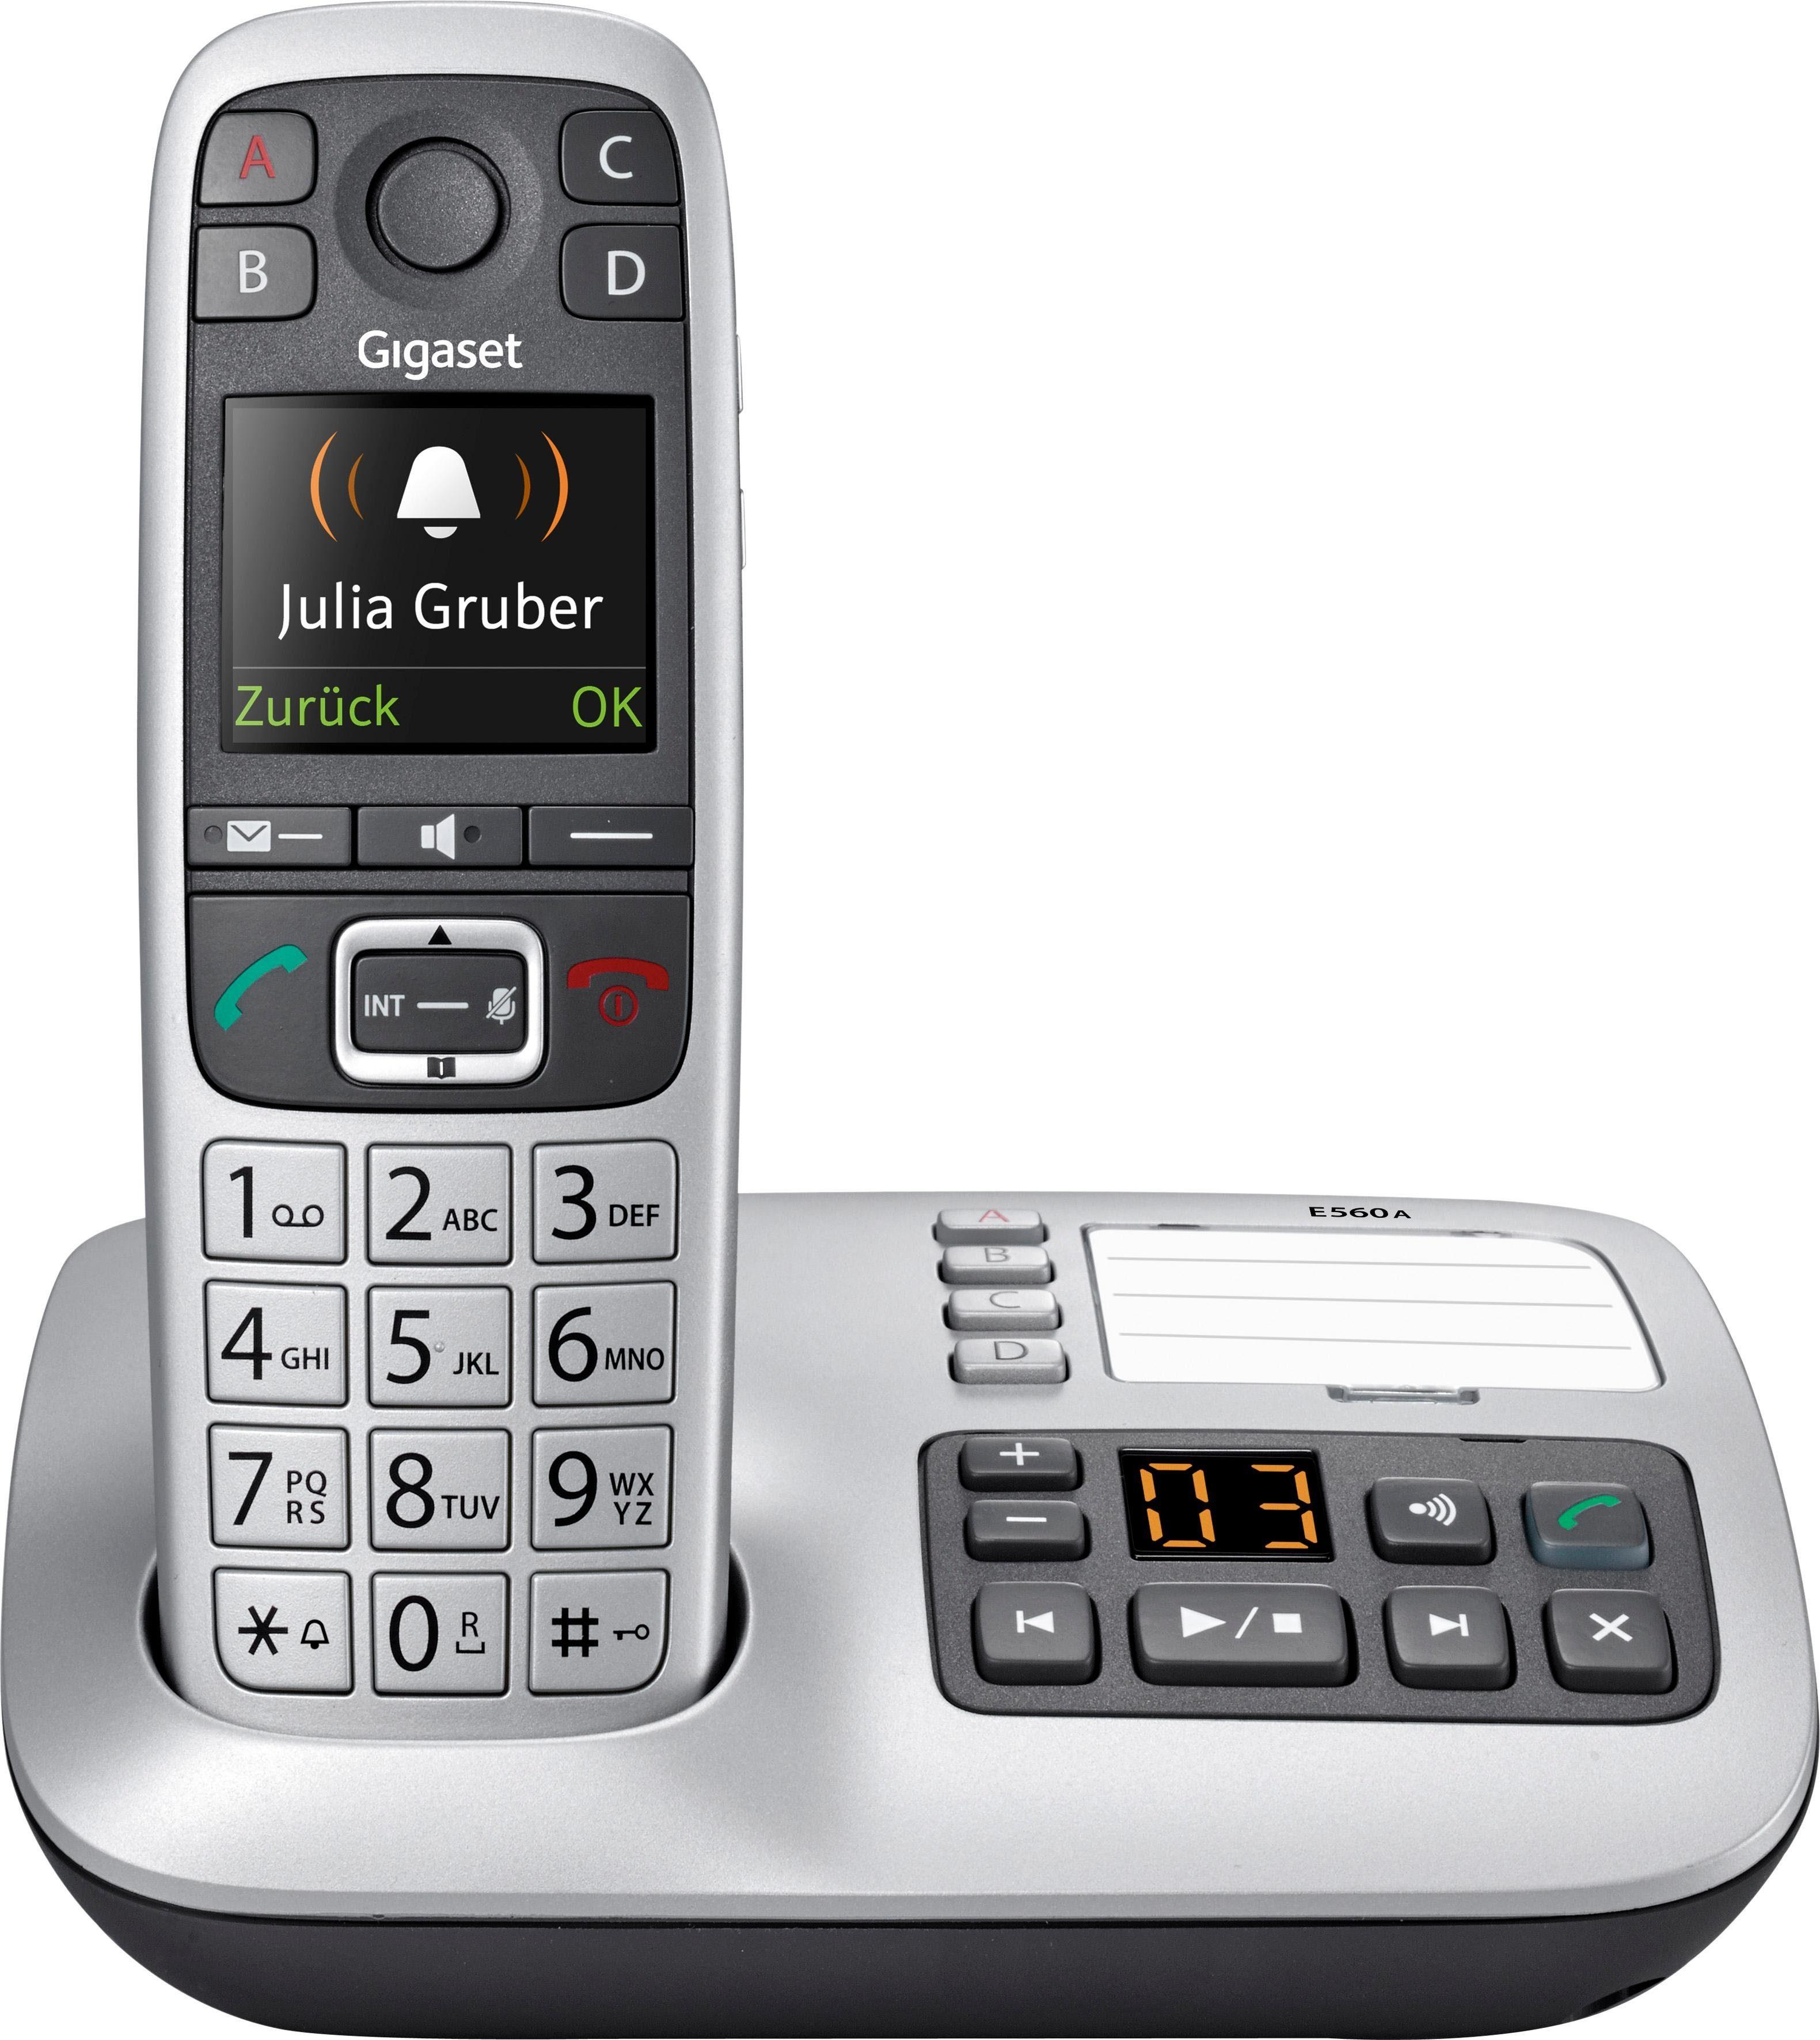 Gigaset E560 A Schnurloses DECT Telefon mit AB